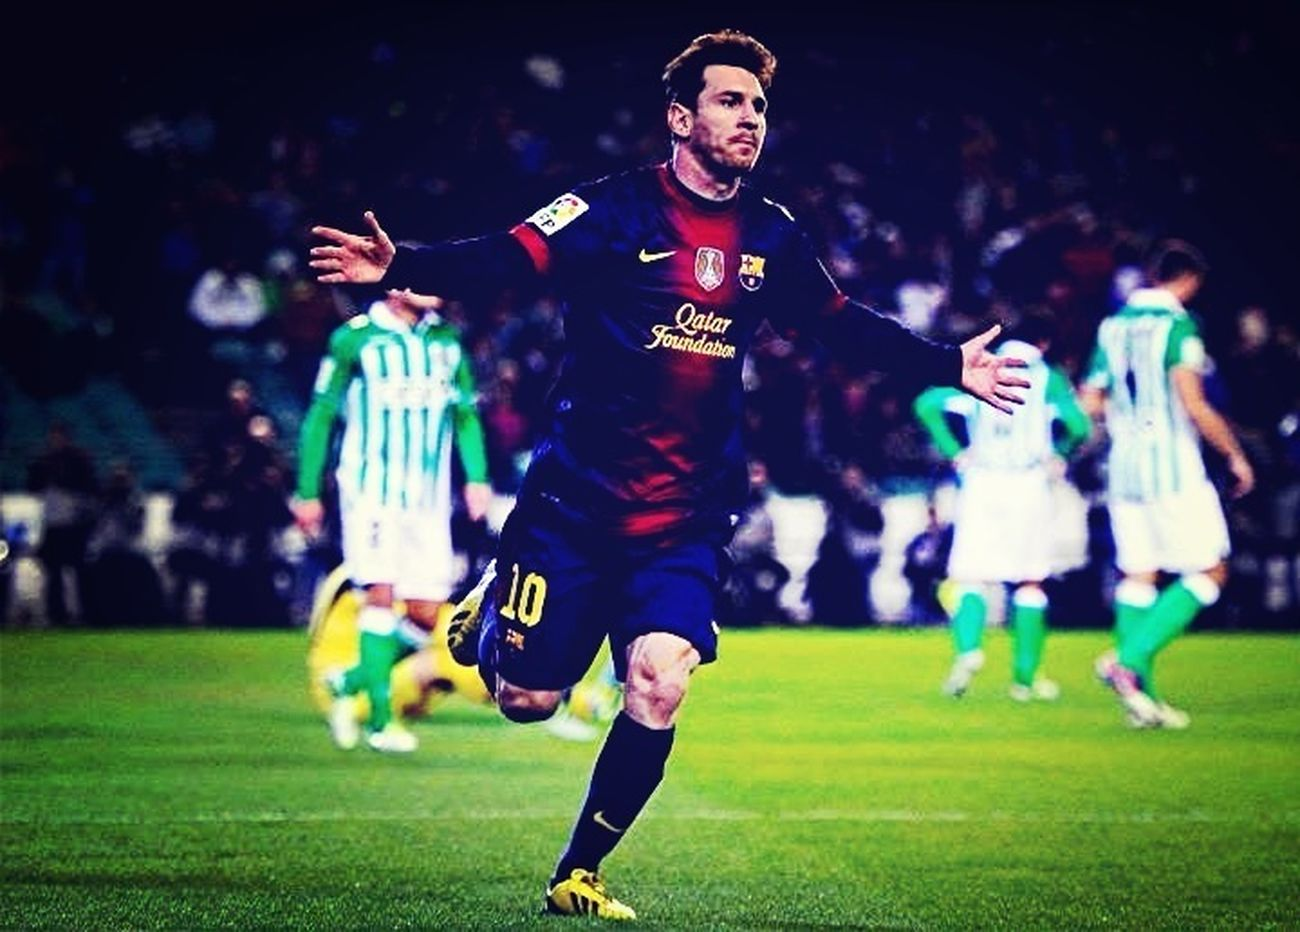 Favorite Soccer Player ⚽